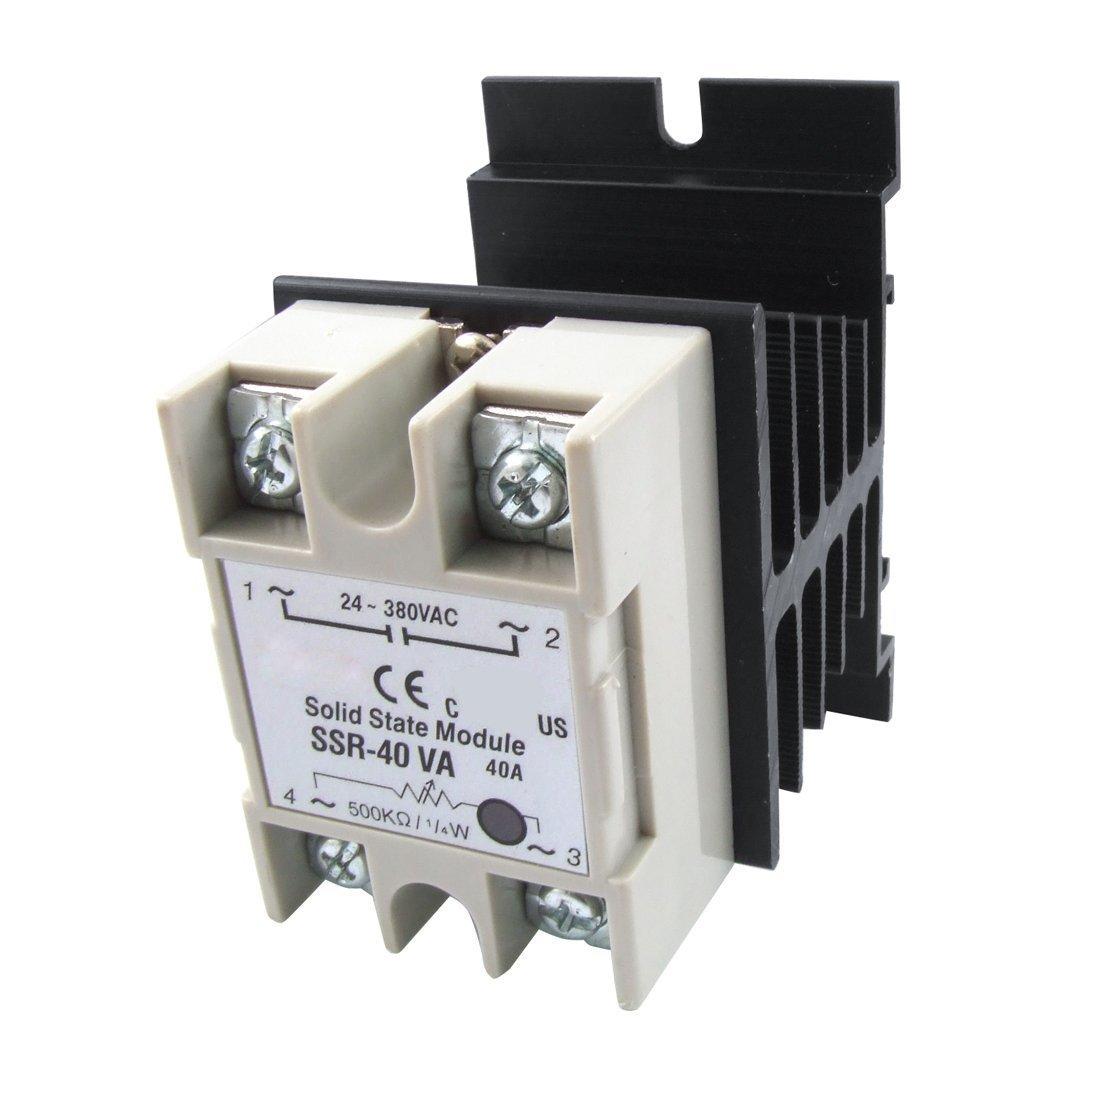 R Rele TOOGOO Rele de estado solido SSR Regulador de resistencia de voltaje 40A 24-380V AC con Disipador de calor